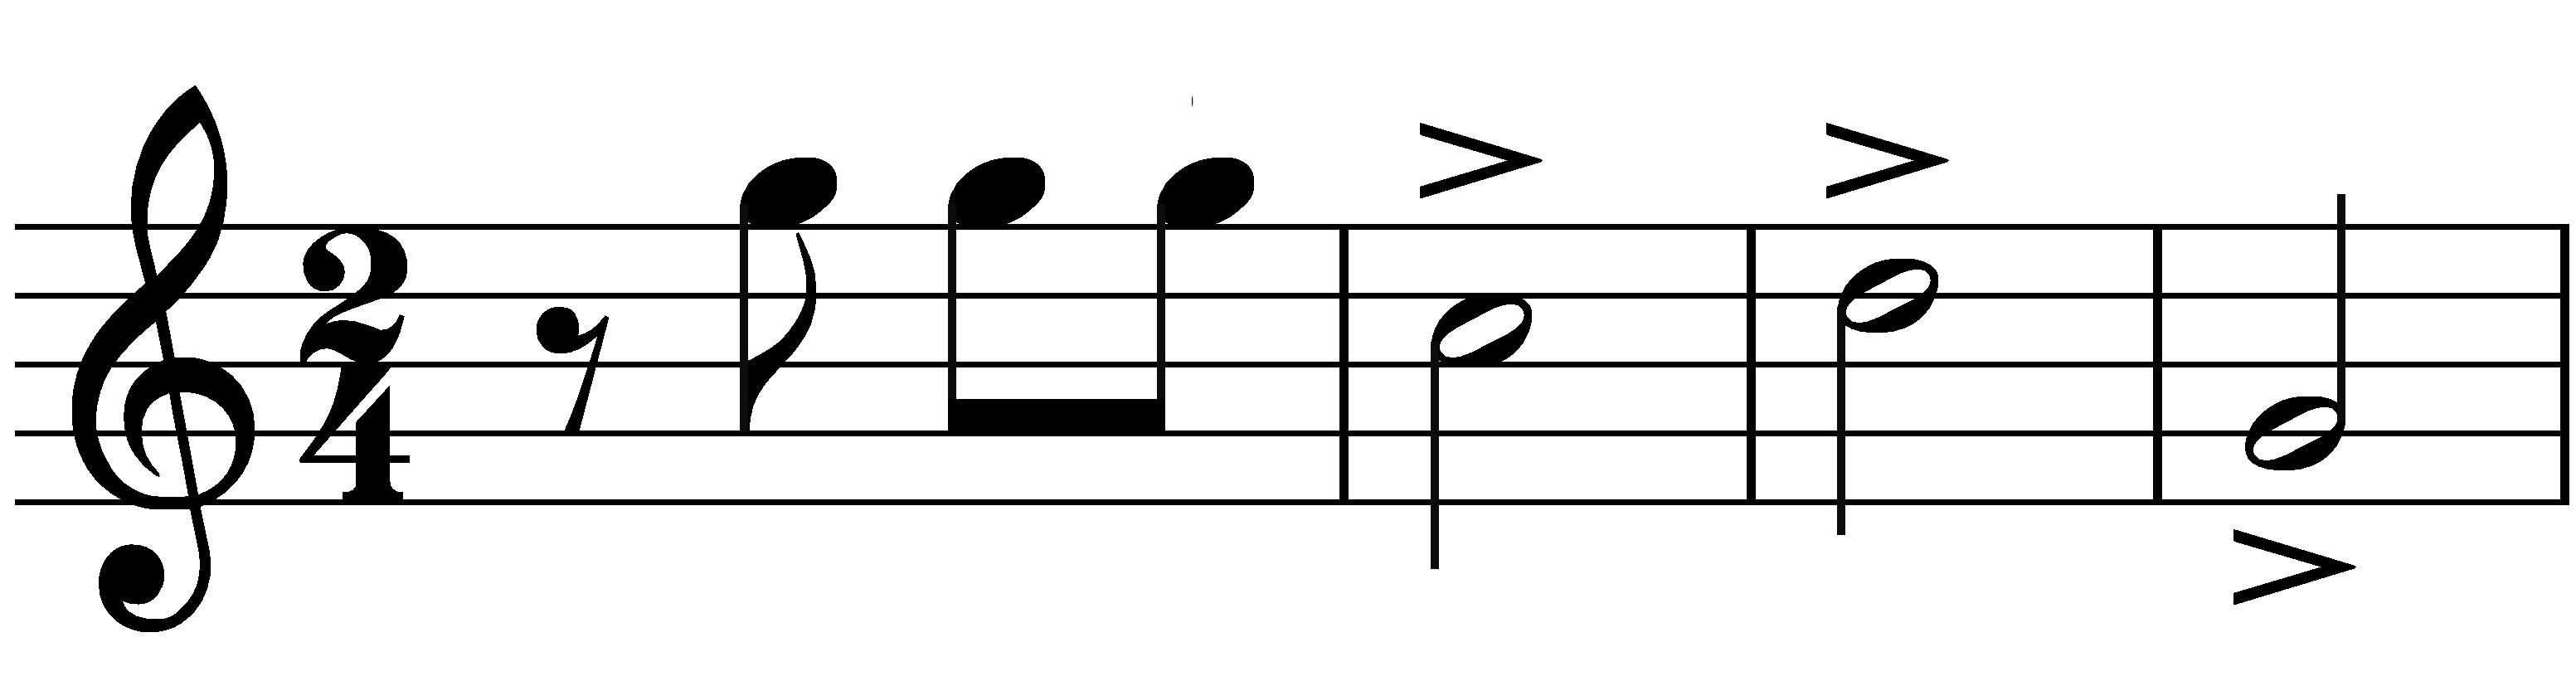 File:Beethoven symphony 5 - transition.png - PNG Symphony